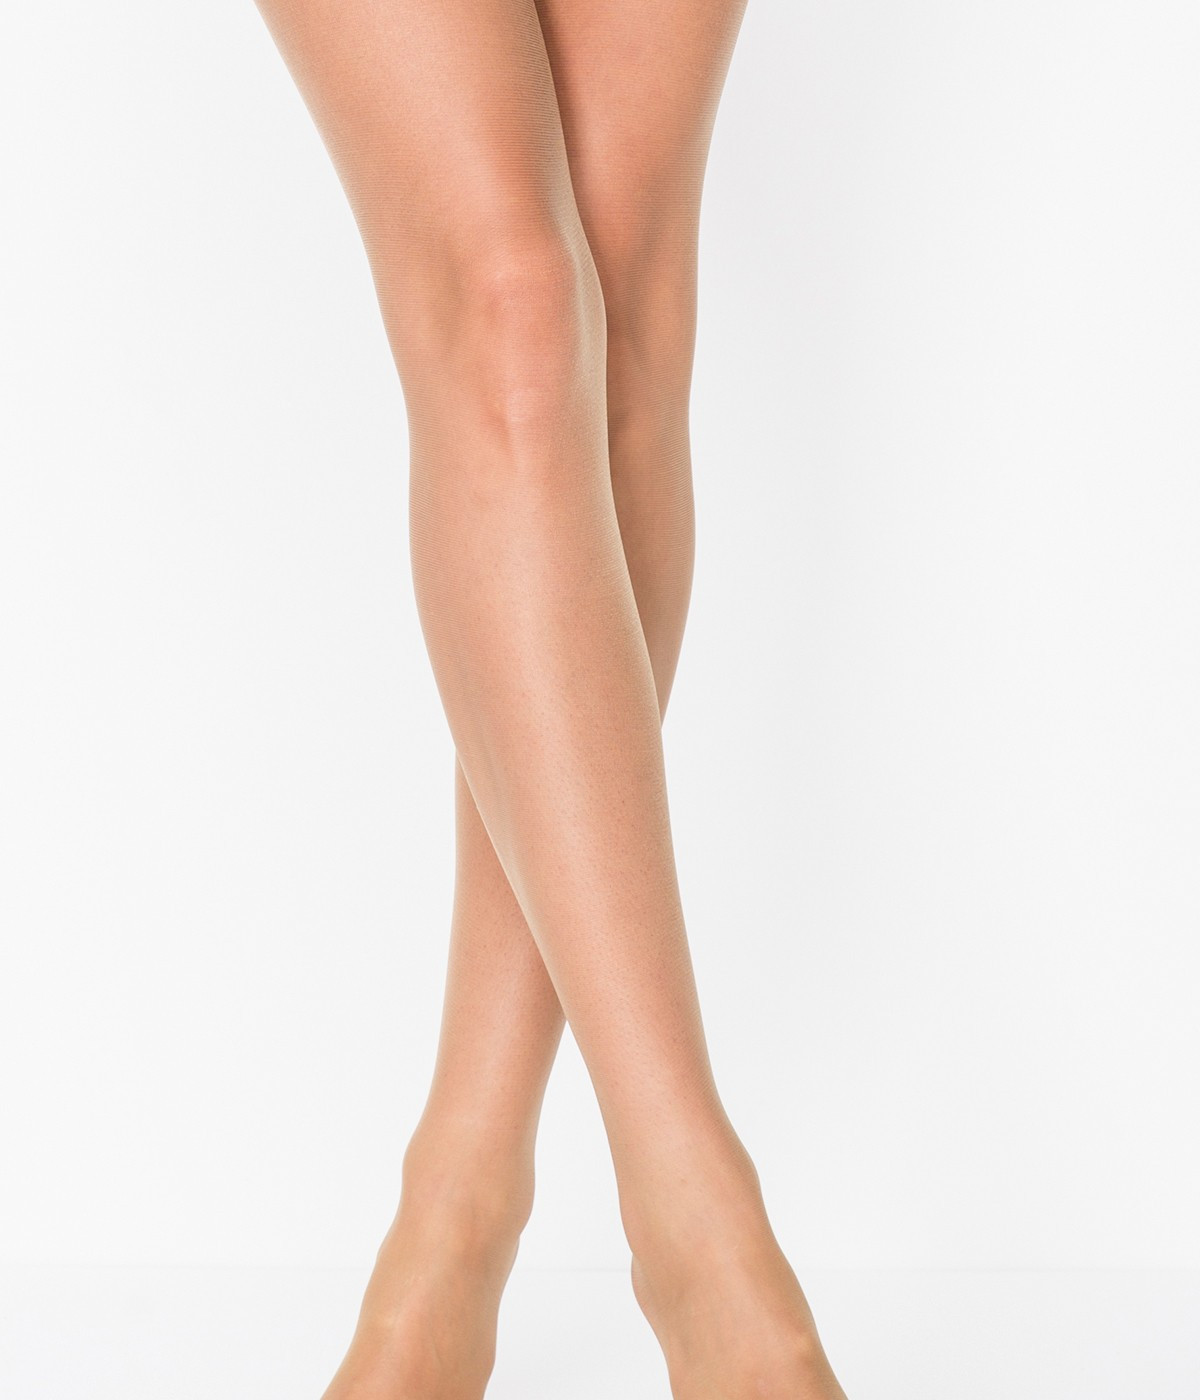 Ciorapi cu chilot Body Control